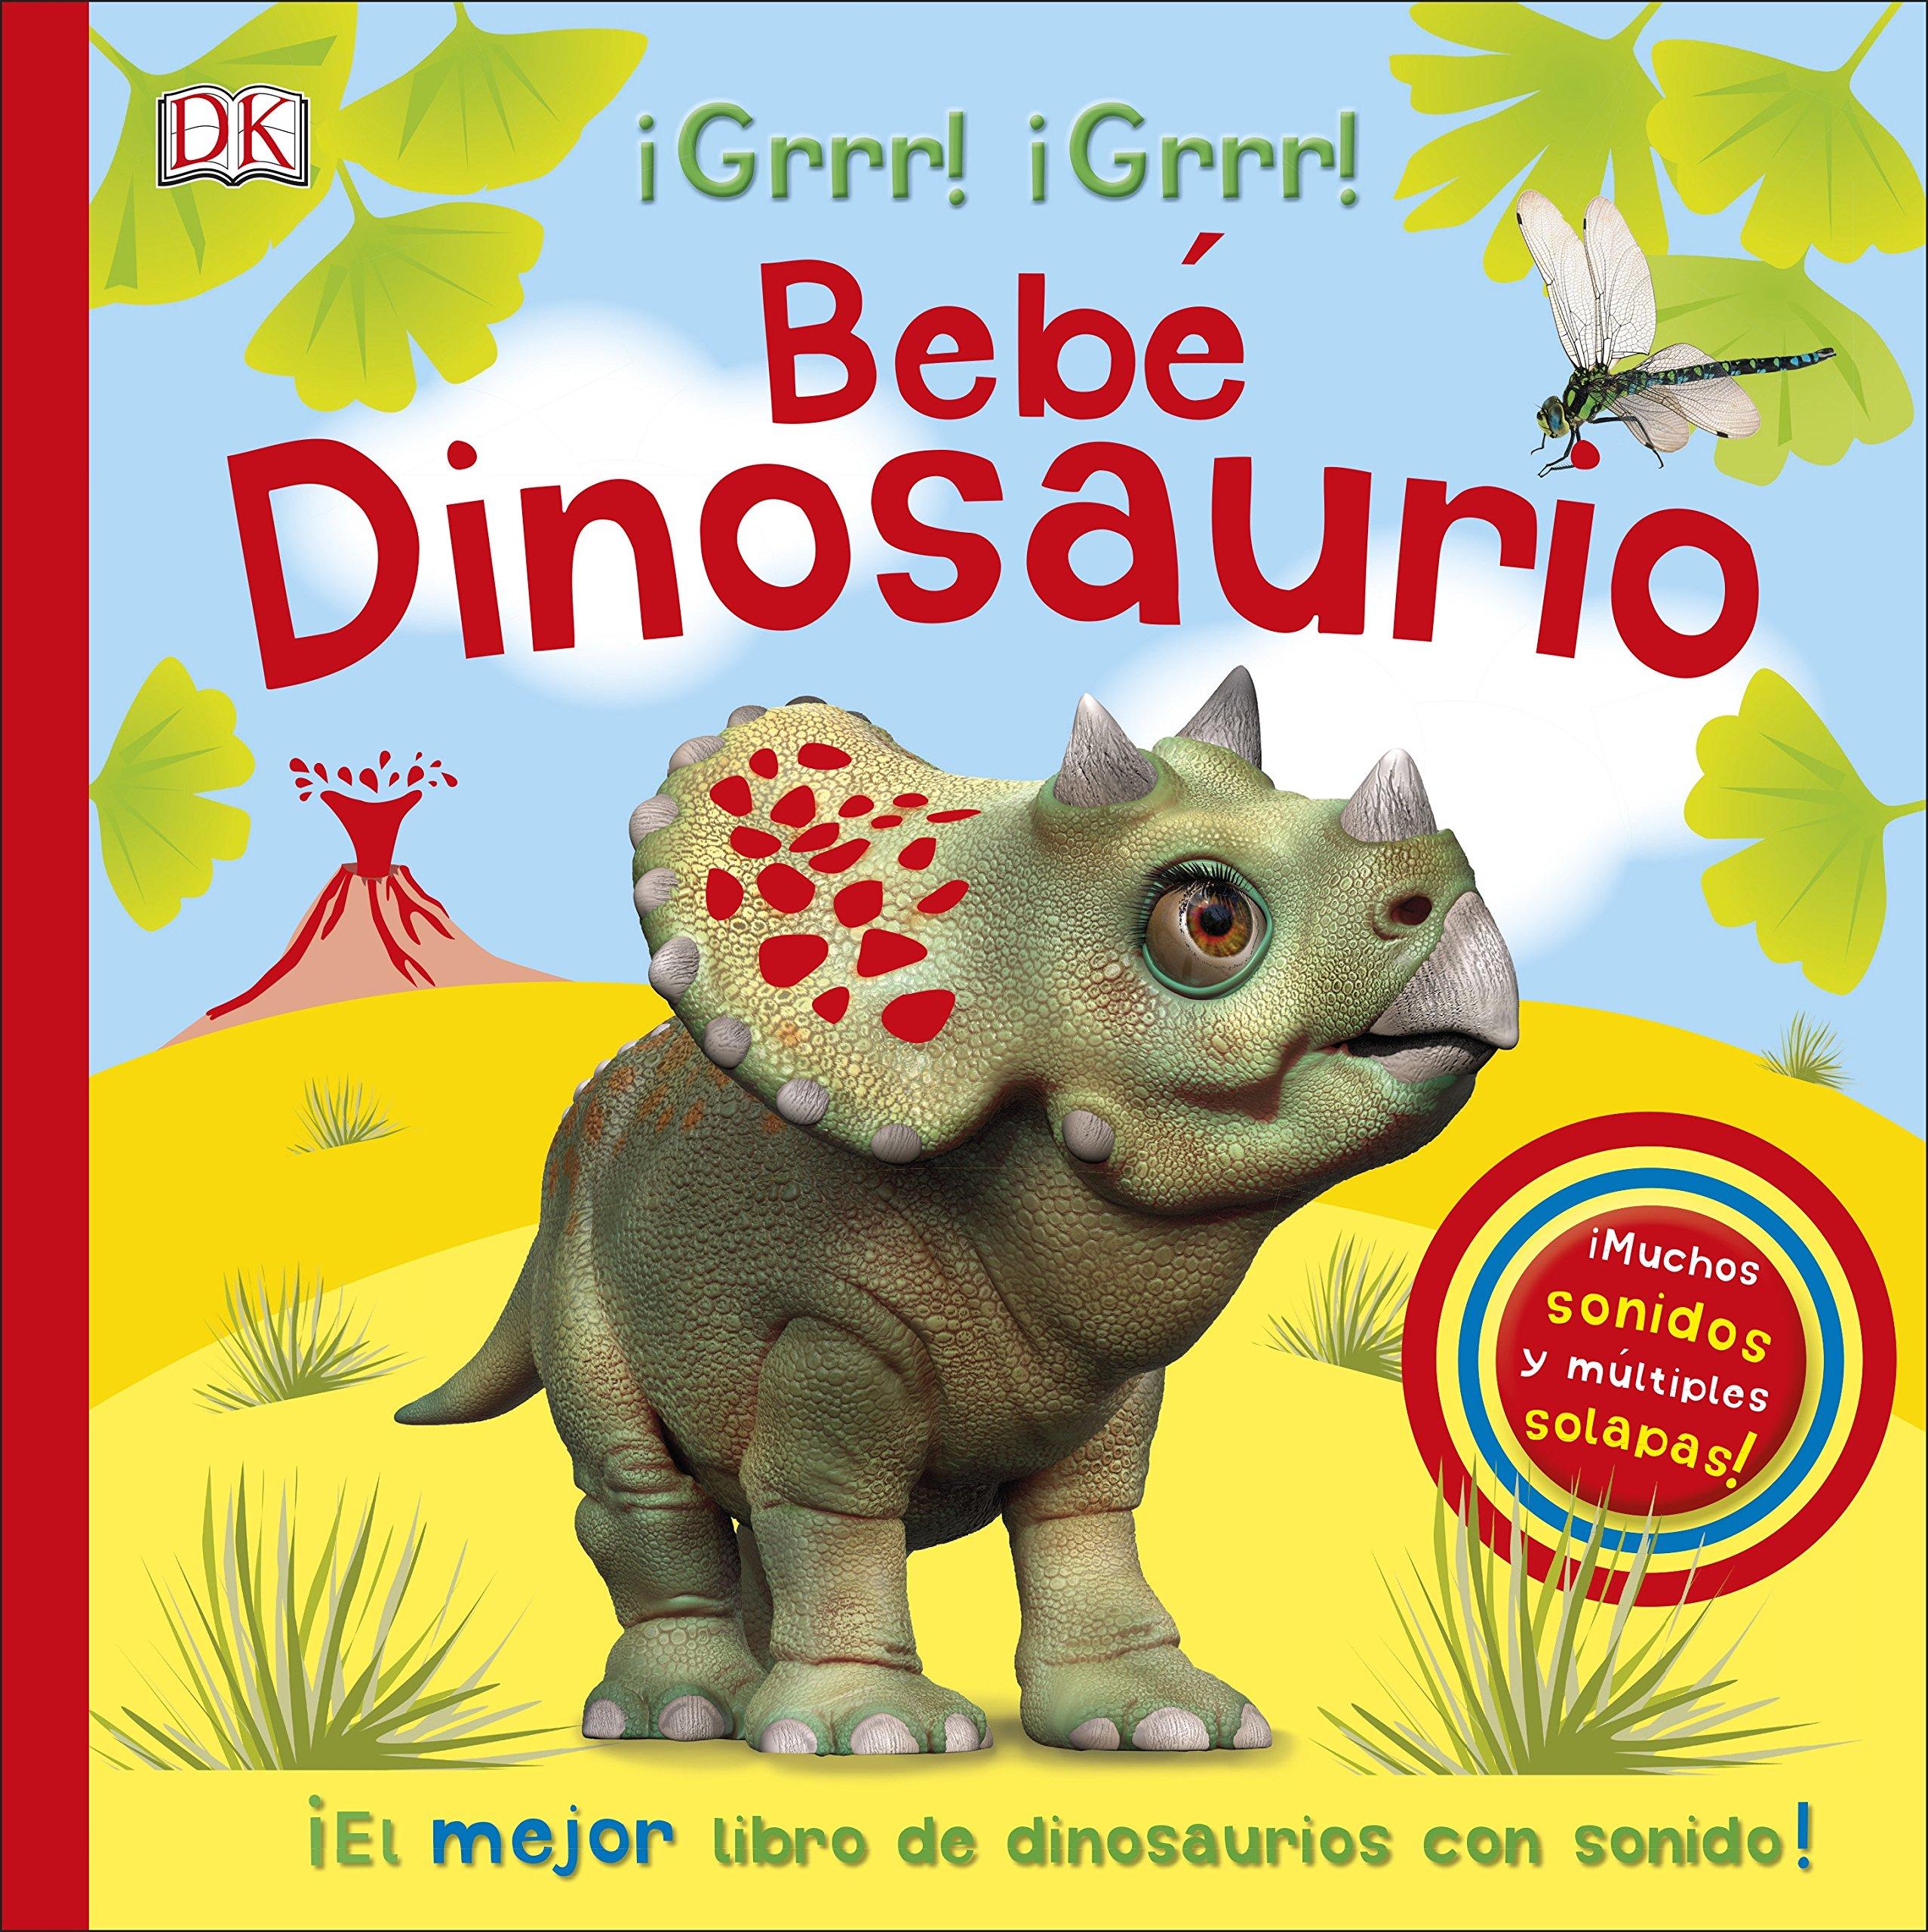 Bebe Dinosaurio Libro Infantil Con Sonidos Preescolar Amazon Es Varios Autores Libros Dibujos de dinosaurios para colorear fácil. libro infantil con sonidos preescolar